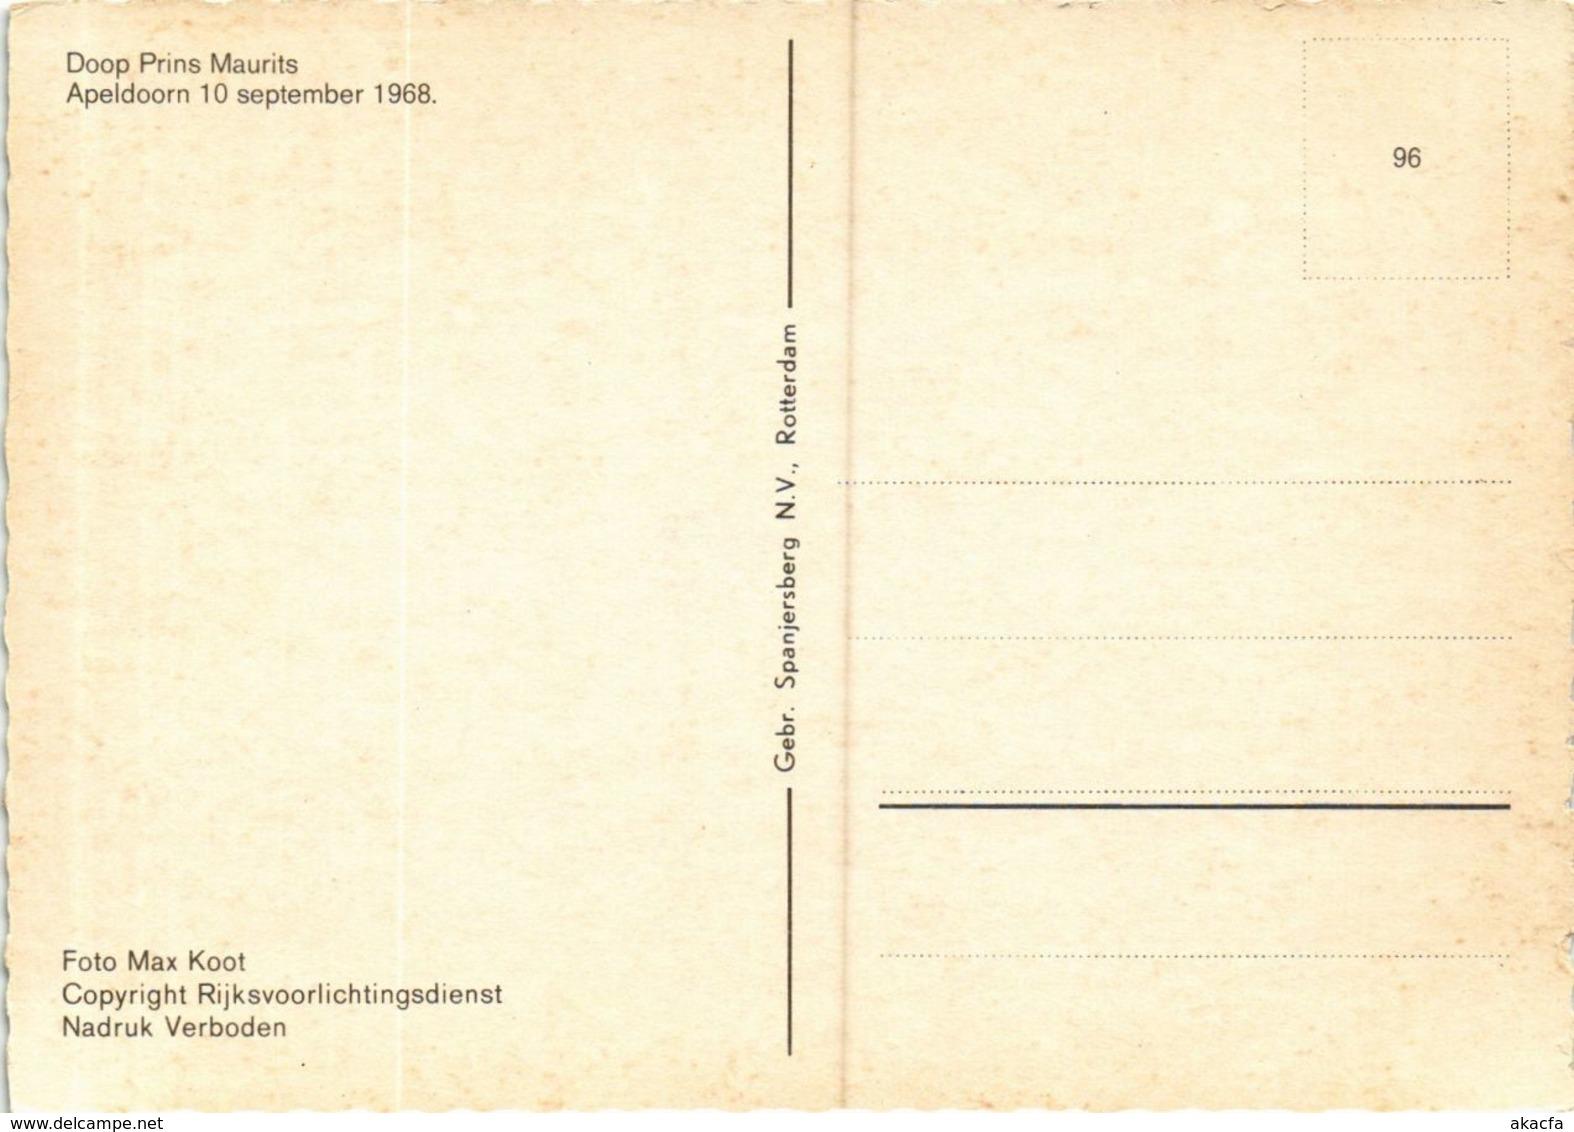 CPM Doop Prins Maurits DUTCH ROYALTY (814536) - Familles Royales